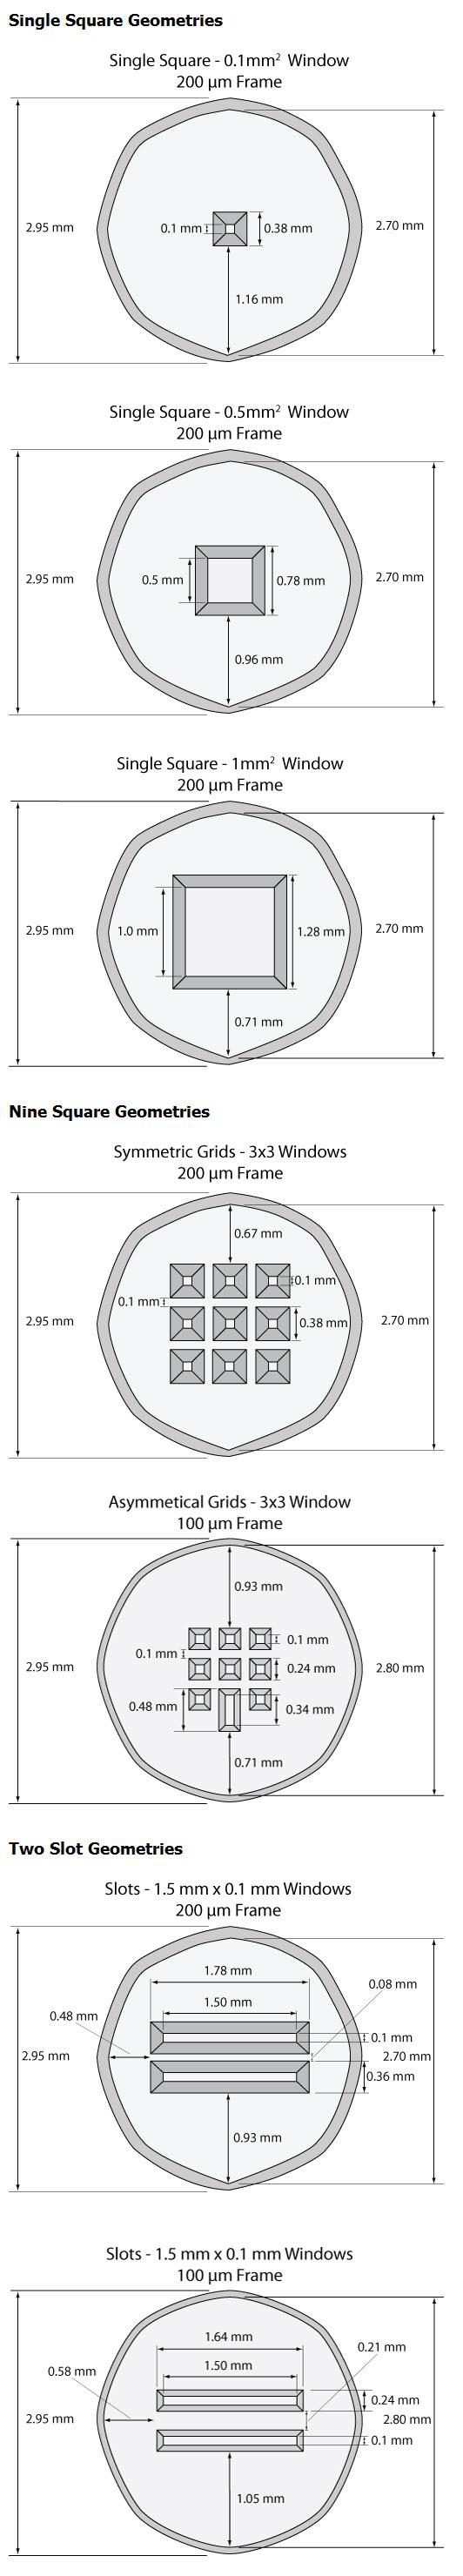 window-geometry-schematics